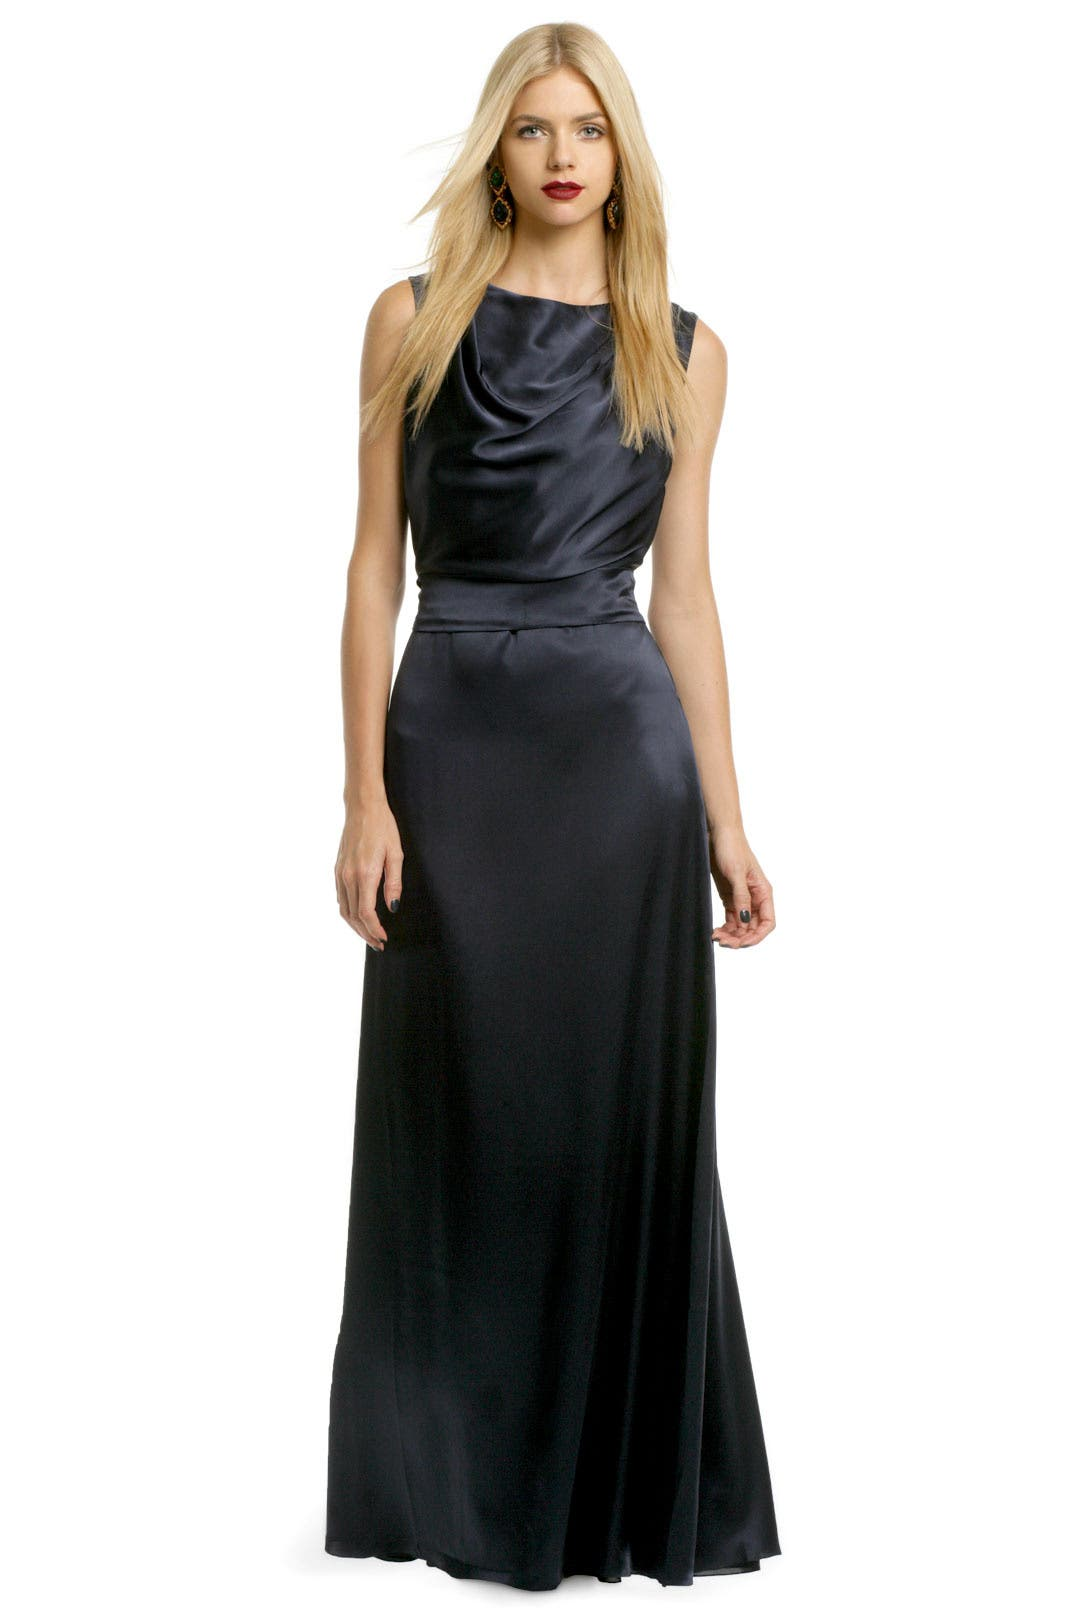 High Impact Gown by Carlos Miele